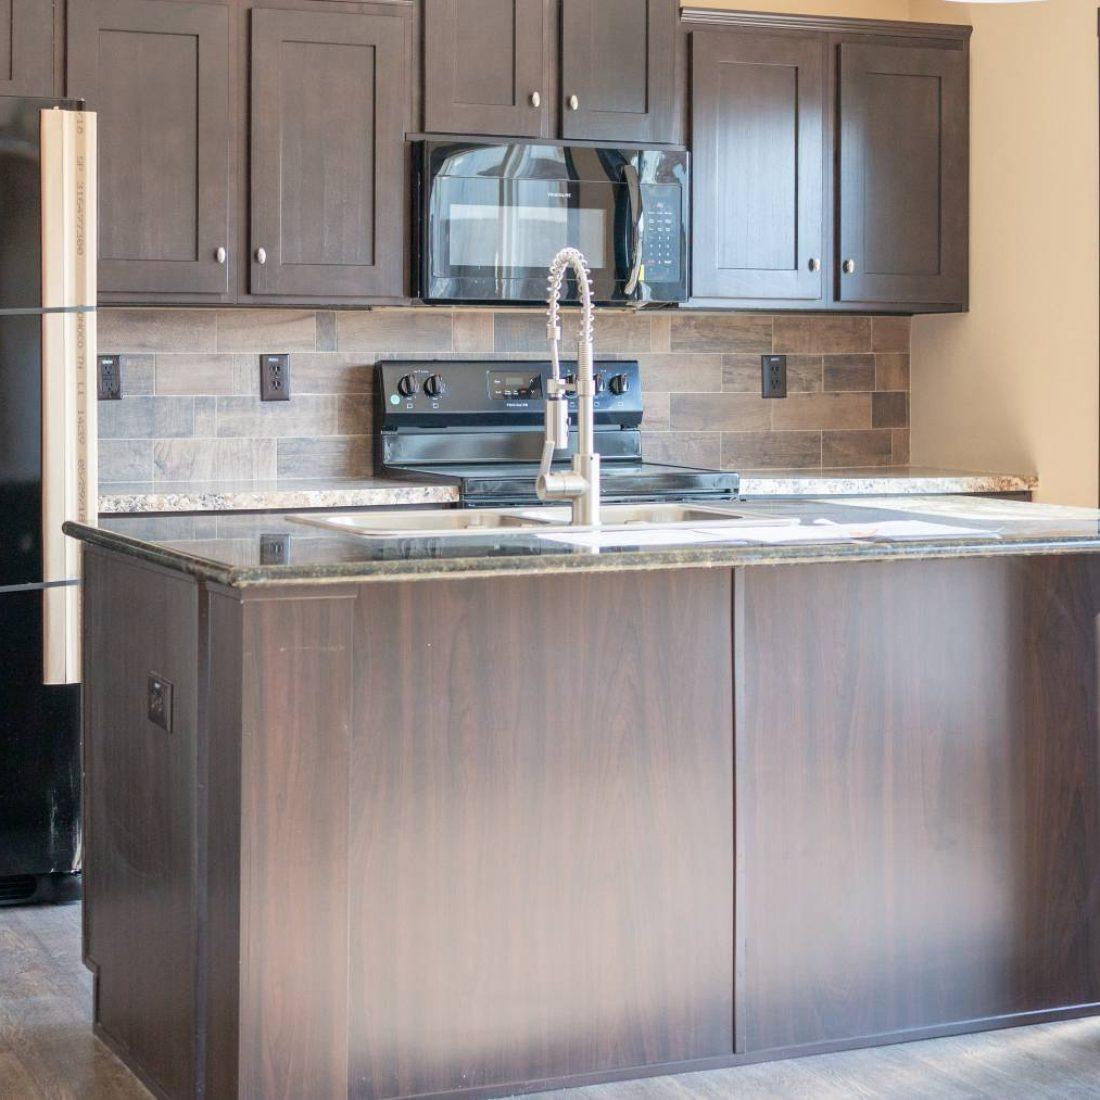 The Washington - Nunn Homes - Manufactured Homes & Mobile